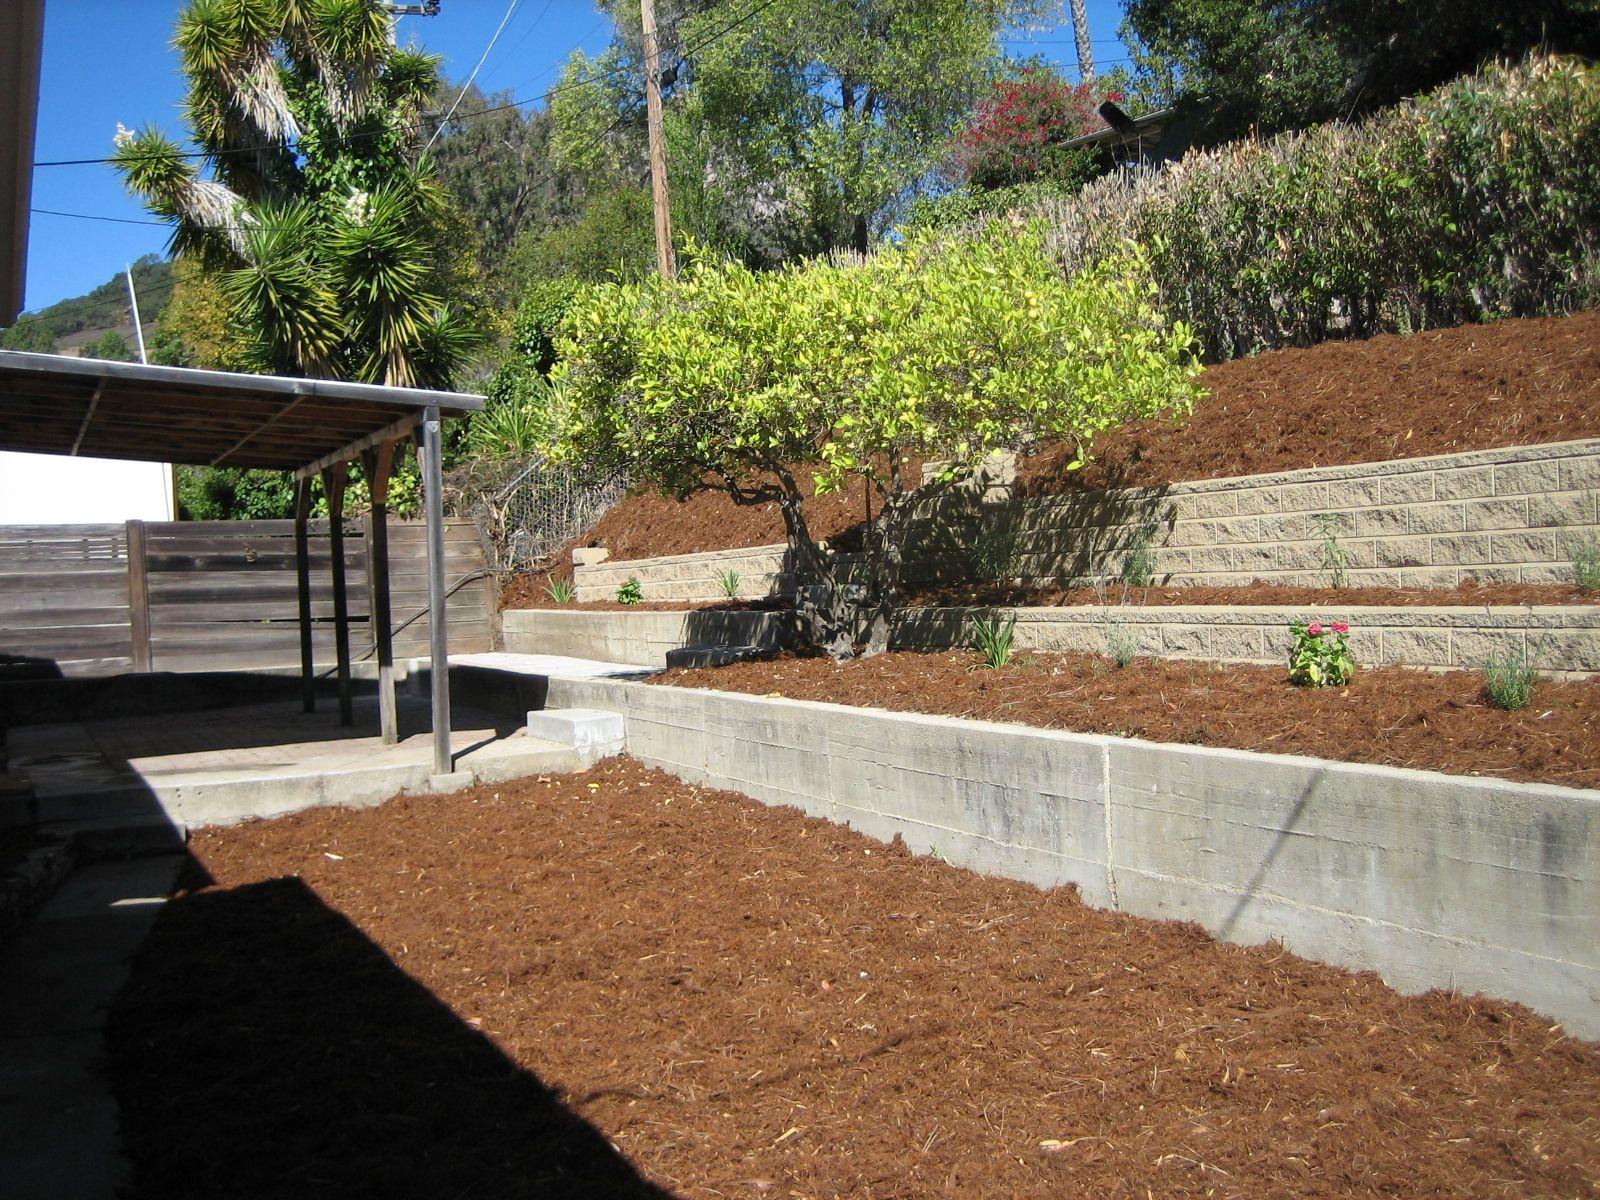 great backyards   Terraced Backyard with attractiveblock ... on Retaining Wall Ideas For Sloped Backyard id=33214